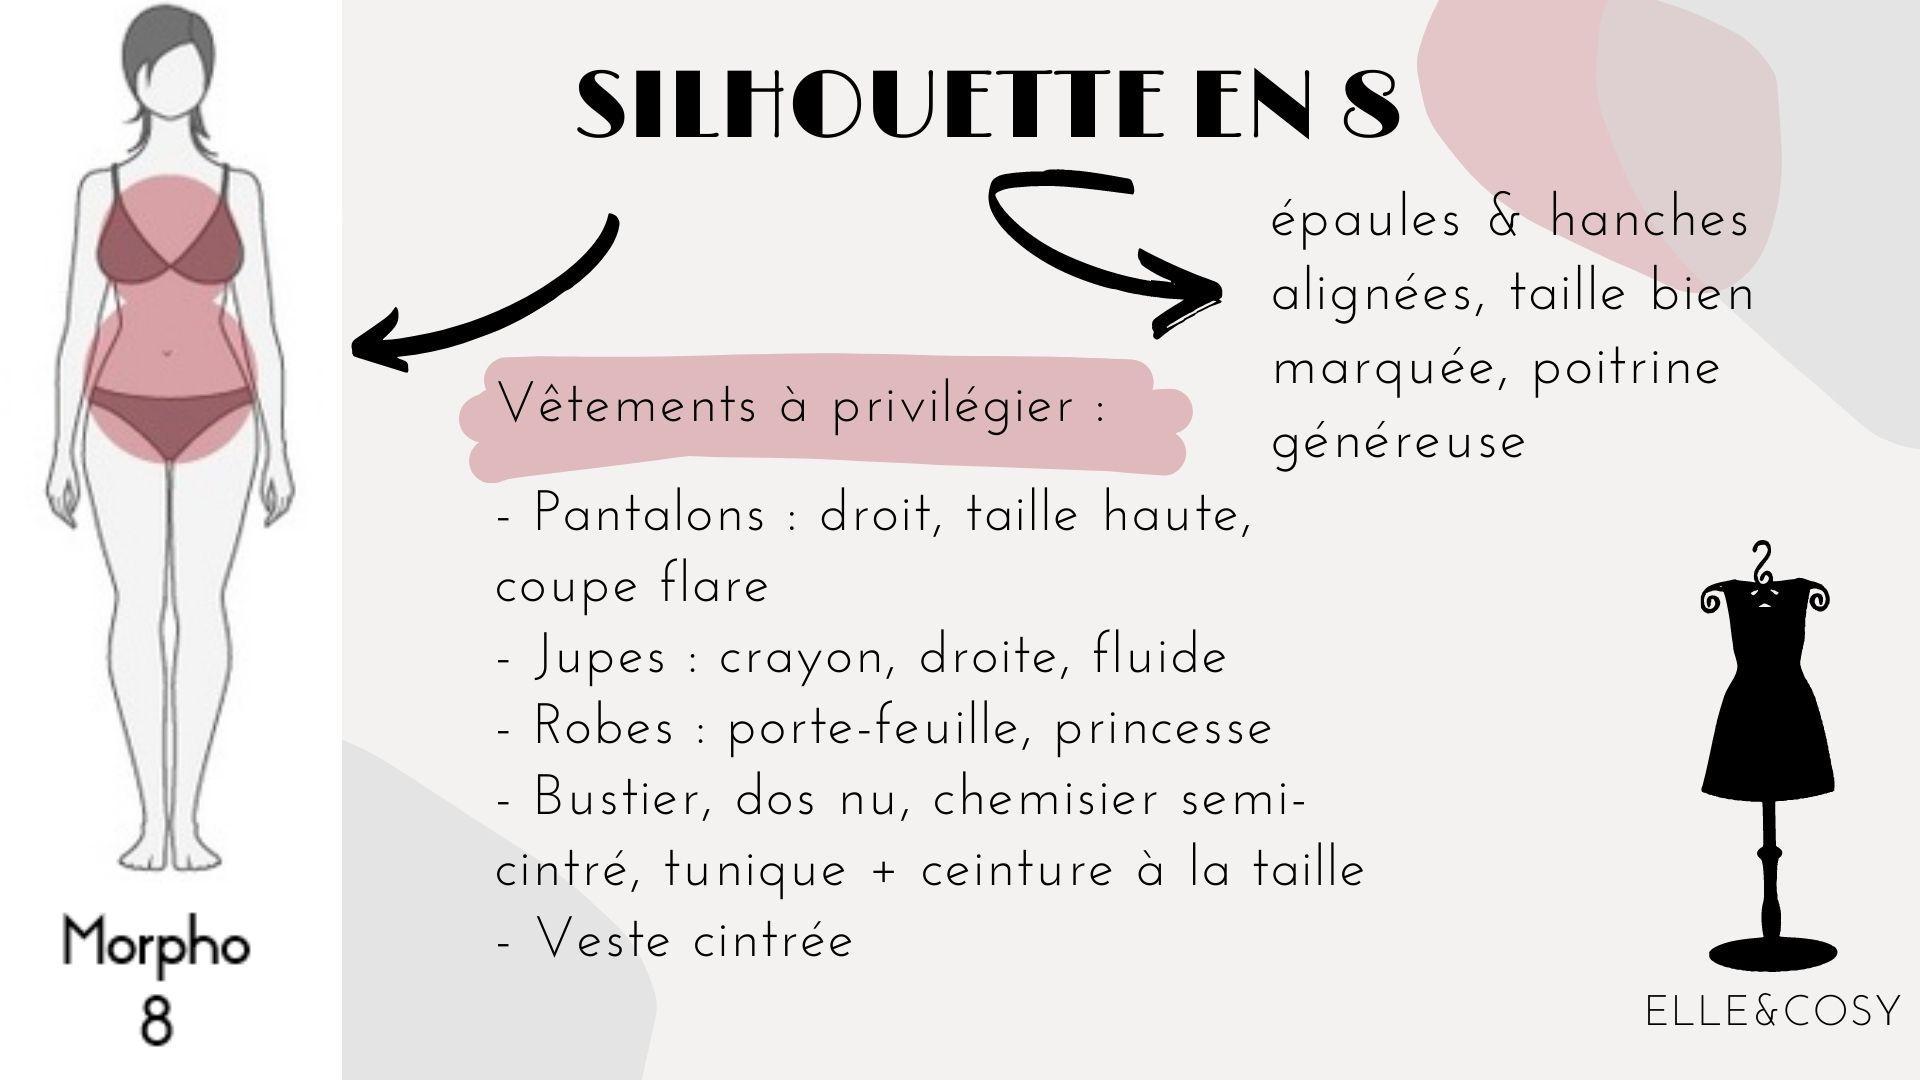 Morphologie - Silhouette